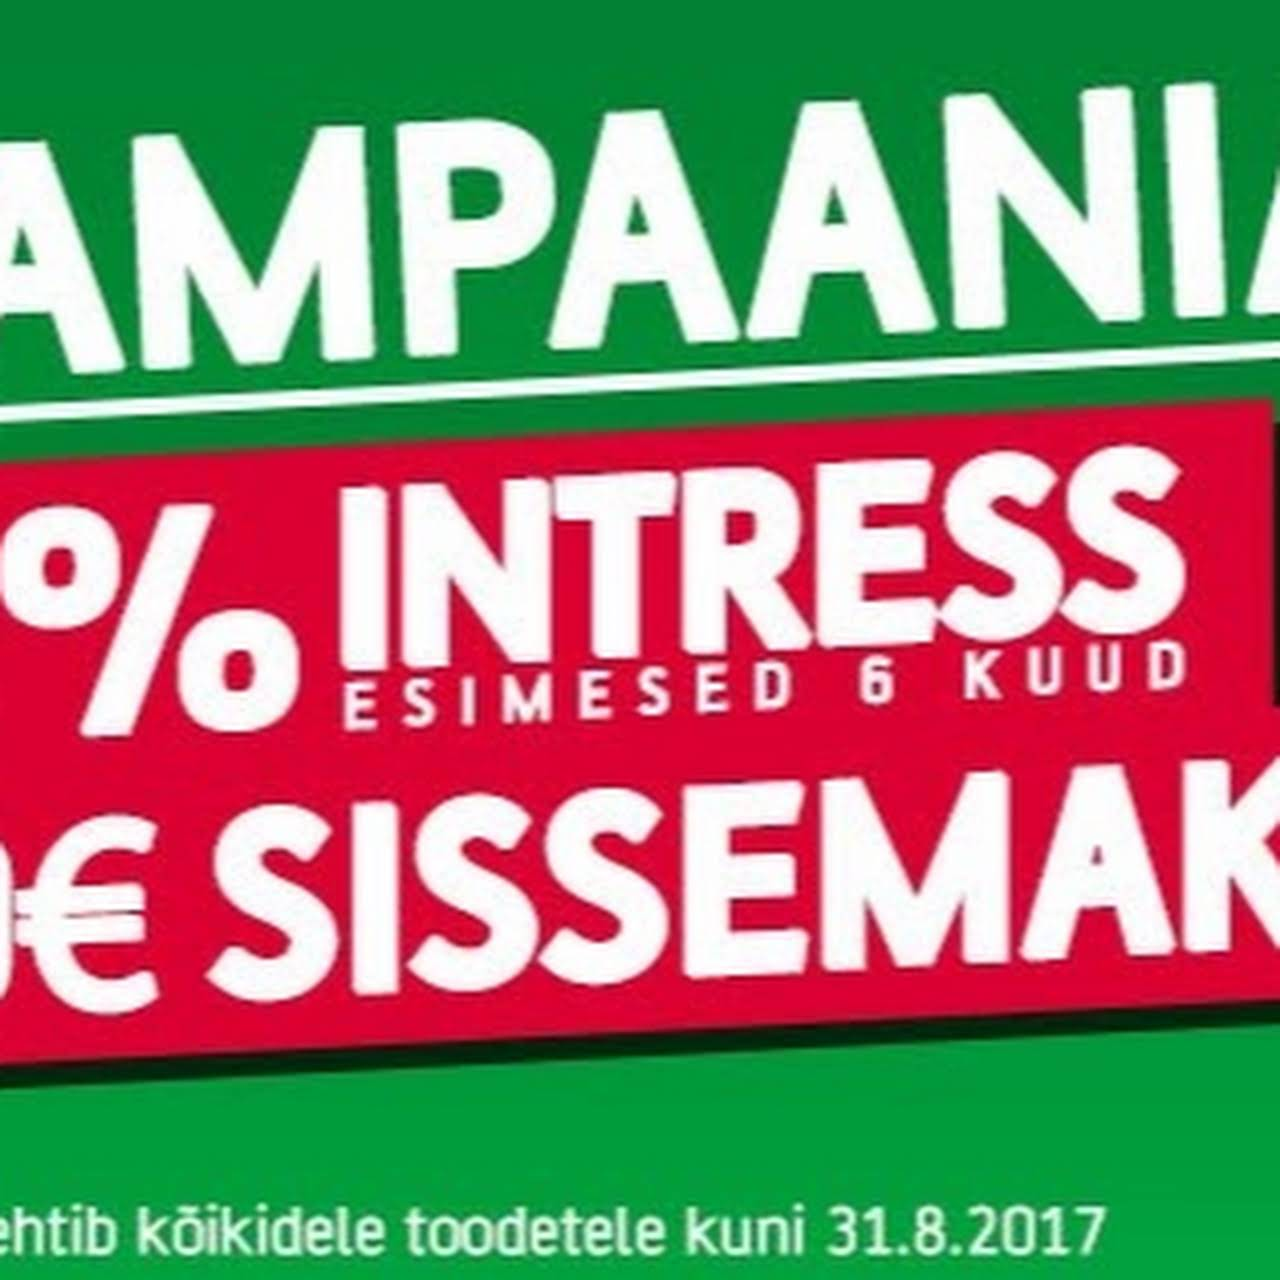 e58e270339b Beebitoodete e-kaubamaja - oneandonlyshop.ee - Baby Store in Tallinn